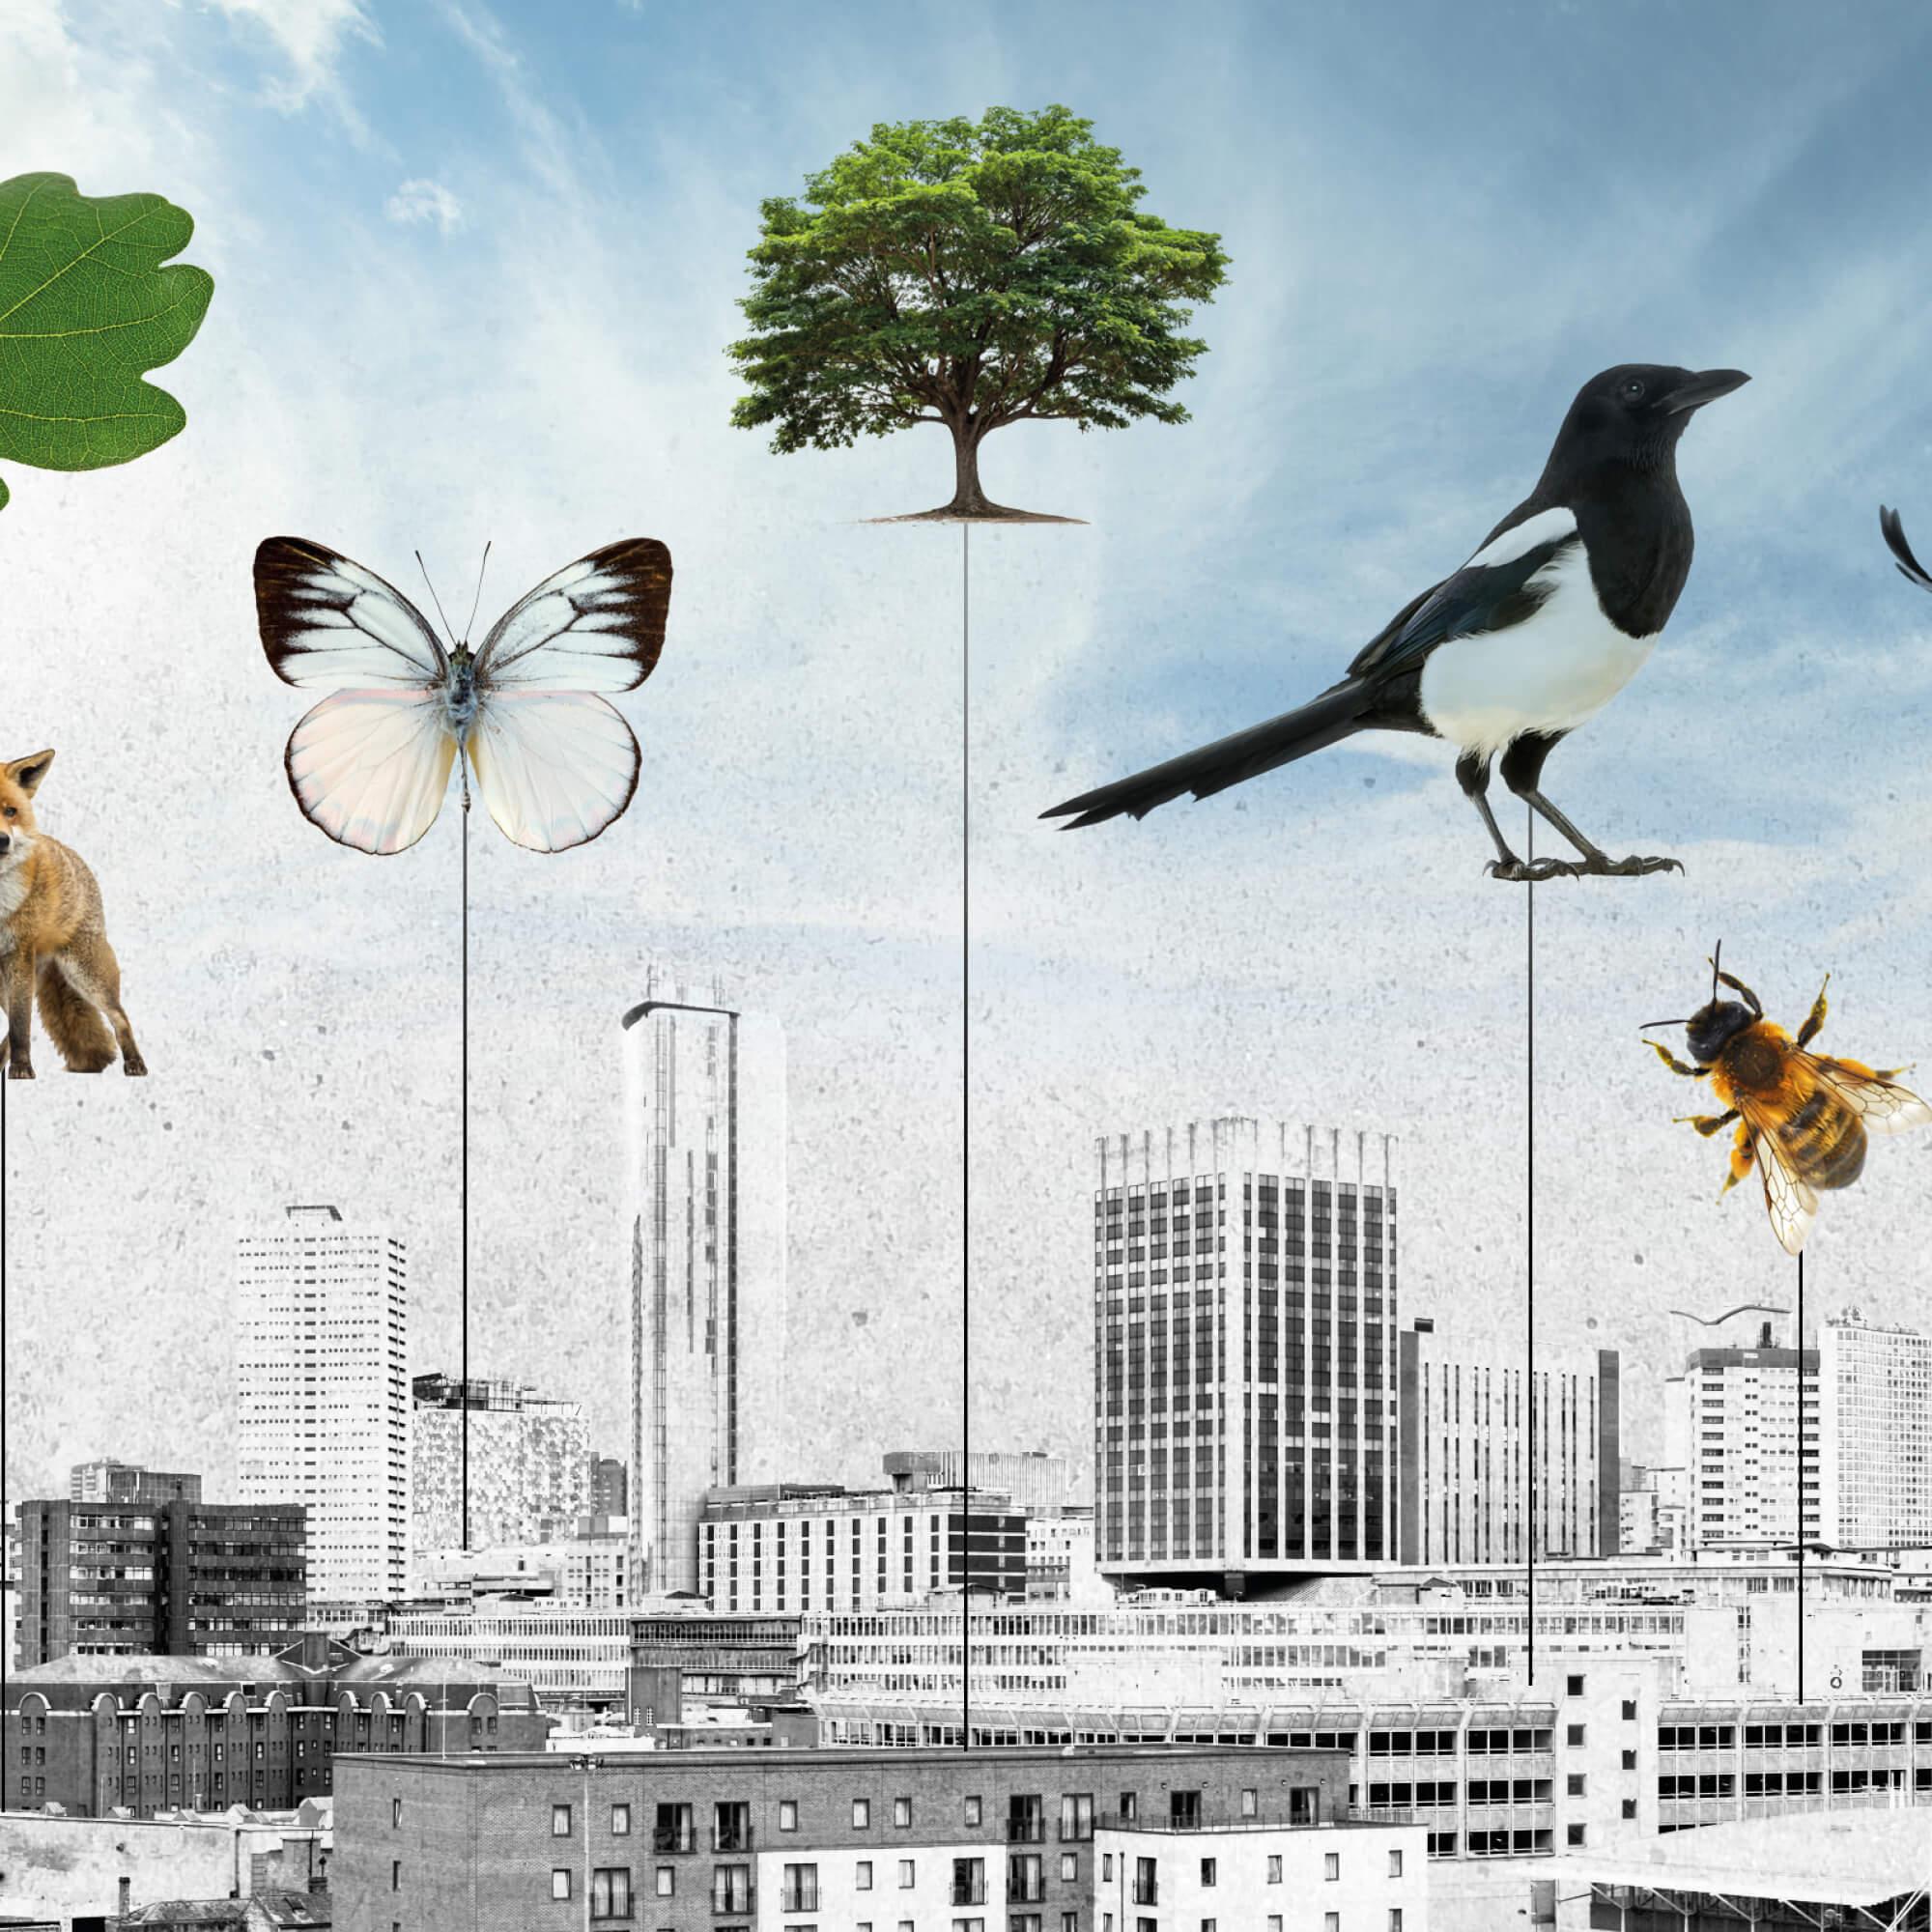 nature against a city backdrop